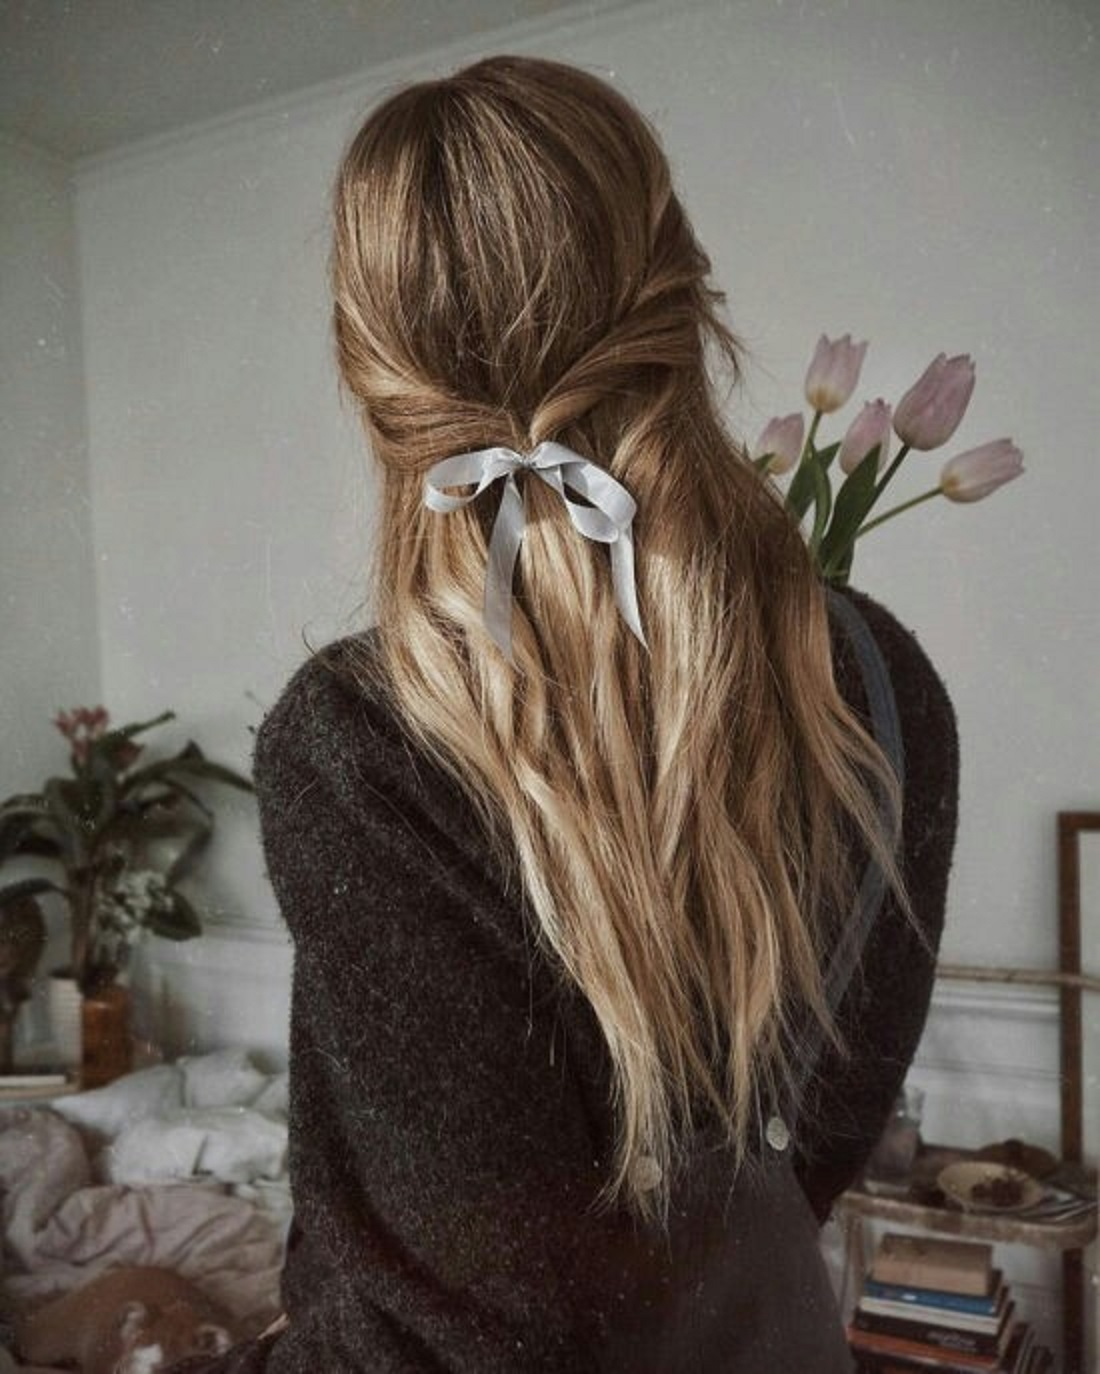 @projectfairytale hair accessories